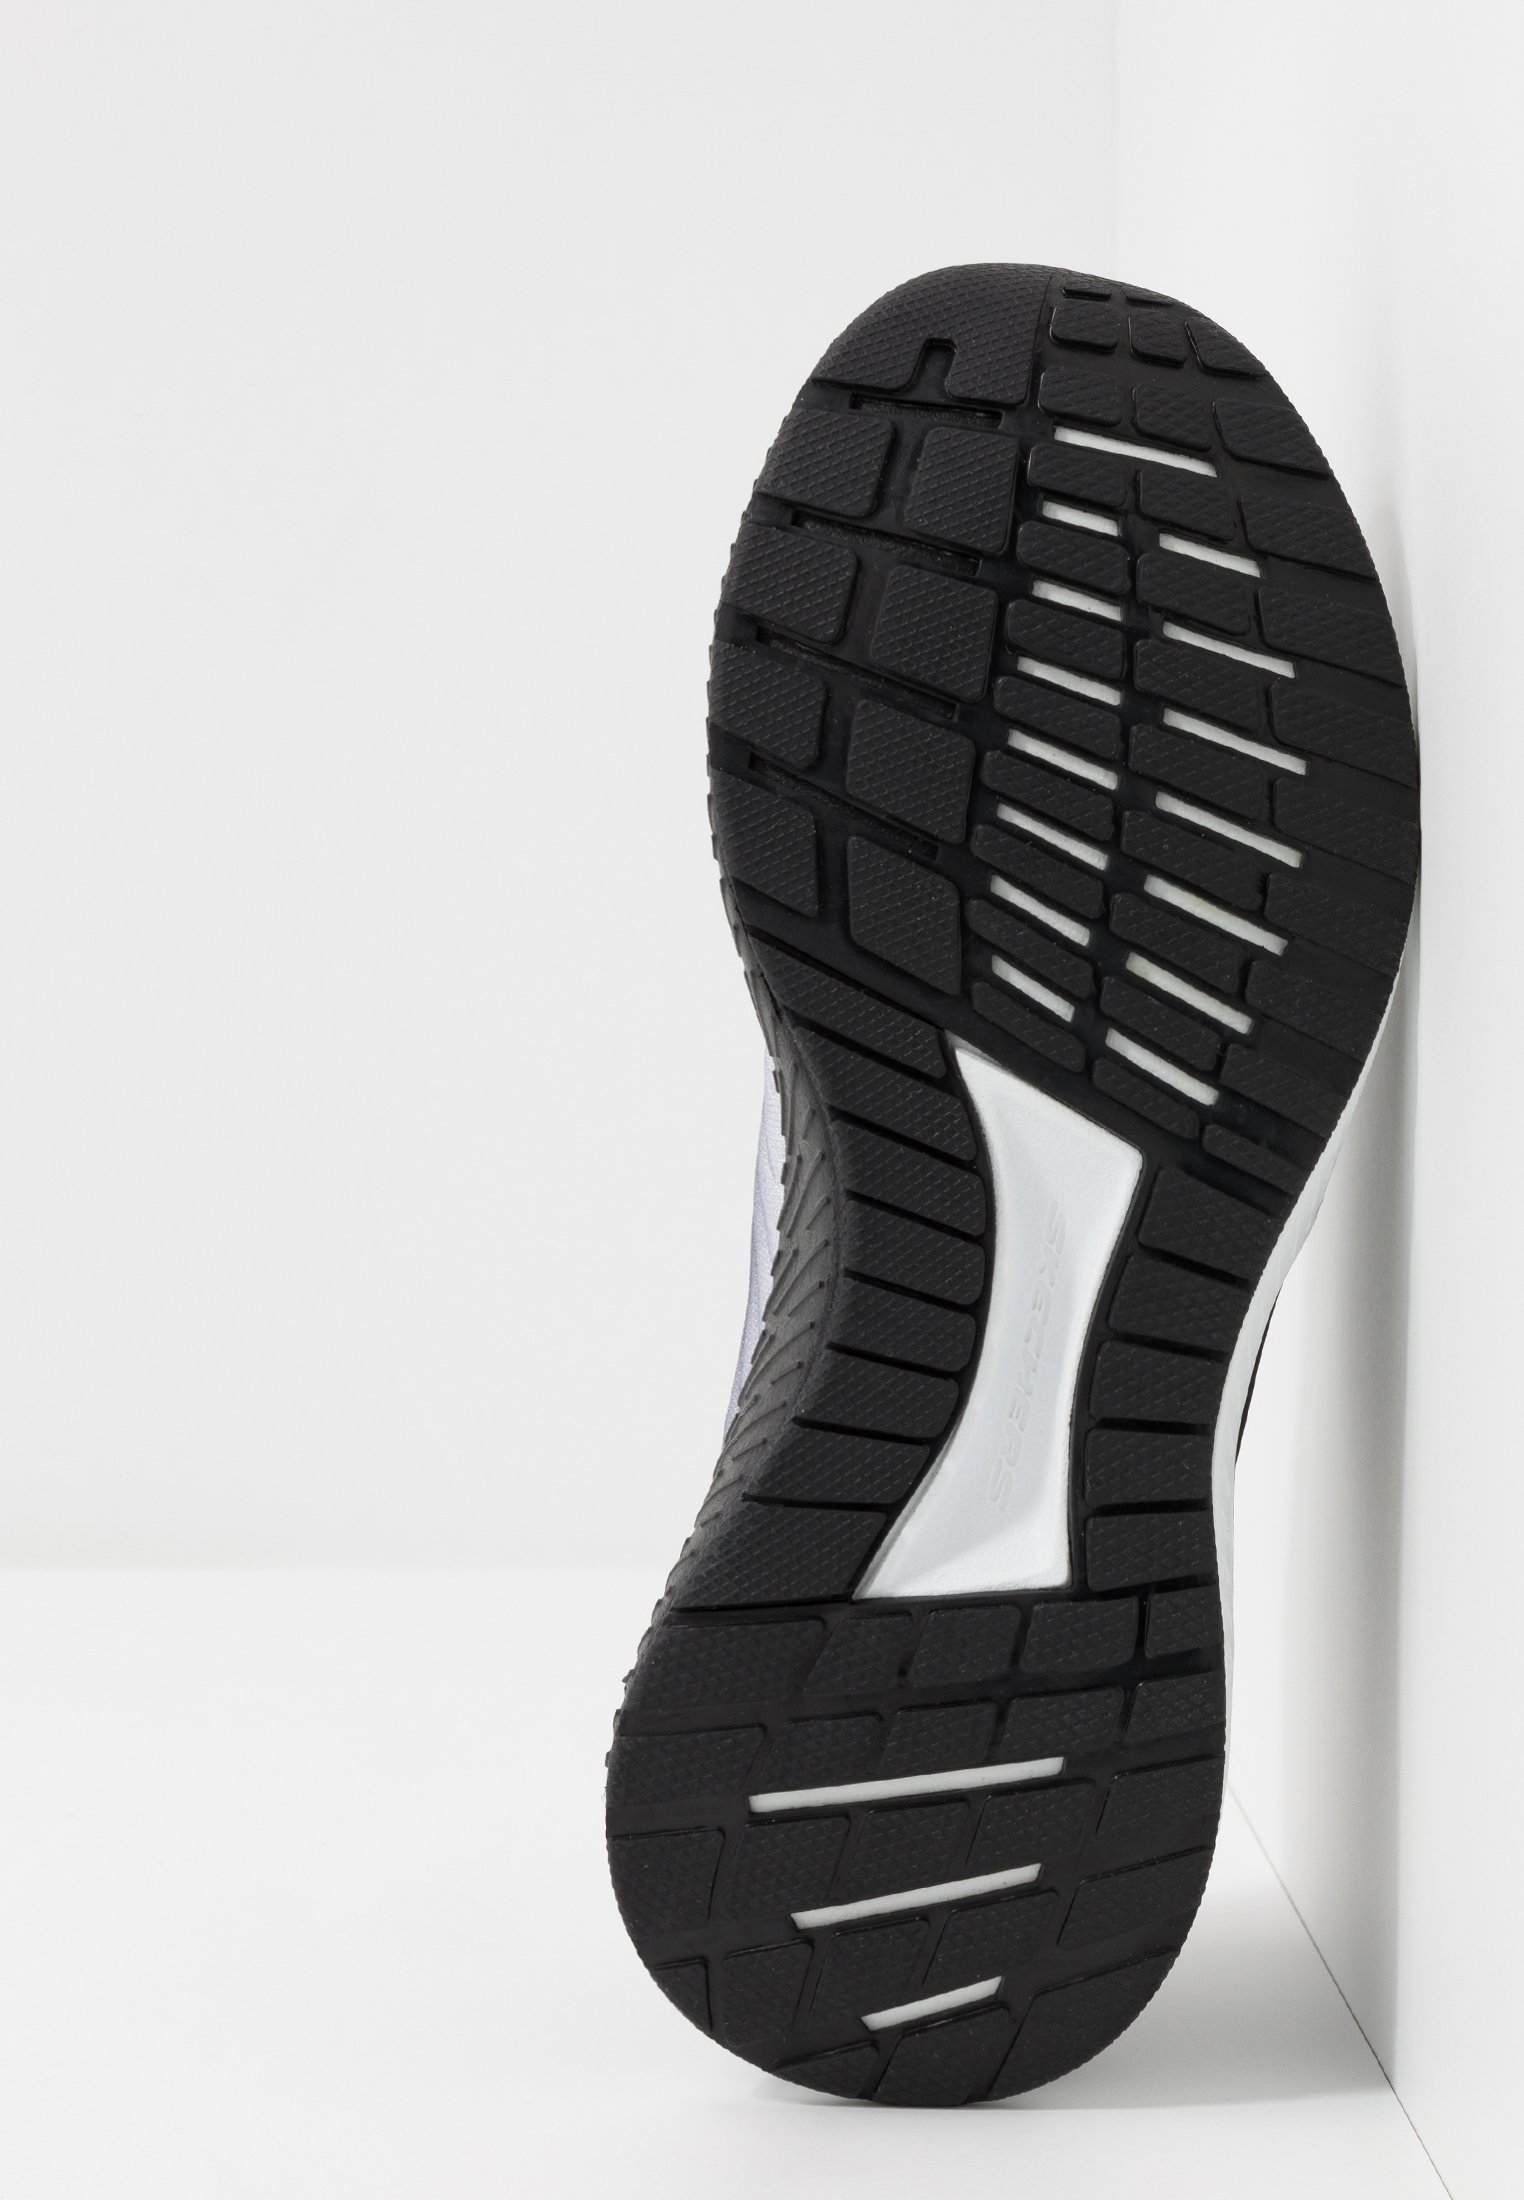 Da Camminata SteadyScarpe Performance Skechers turquoise Run Black Go DWEH2Yeb9I